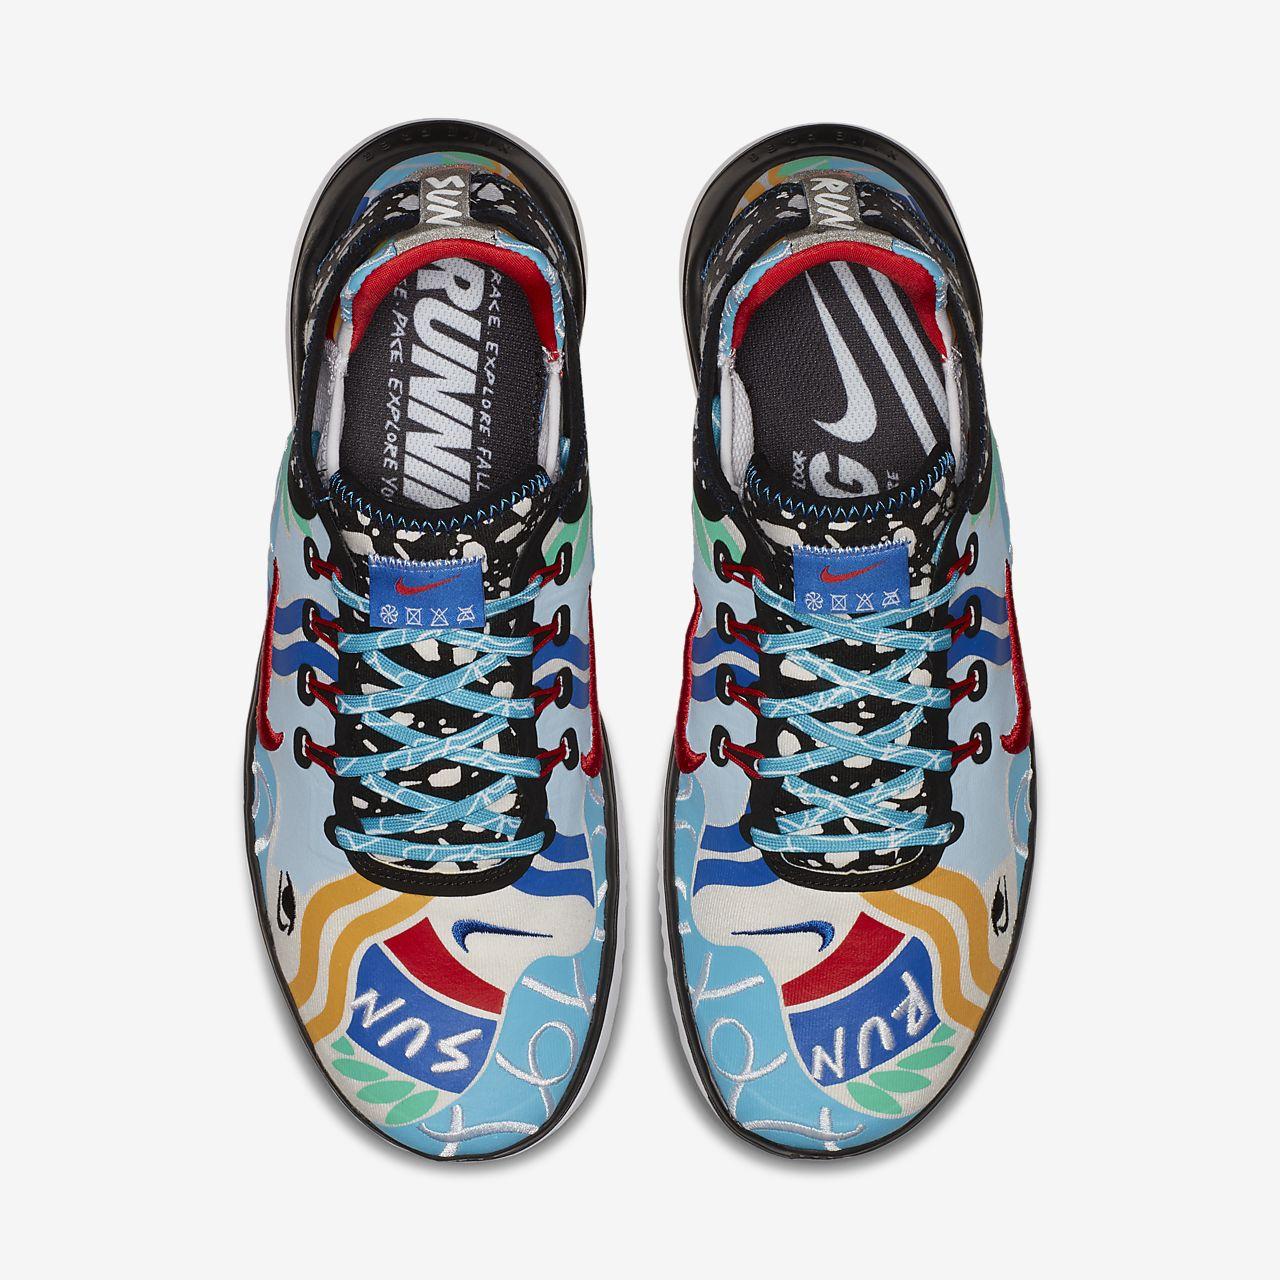 Nike,Free RN 2018 艺术涂鸦鞋面!Free RN 2018 系列官网现已上架!